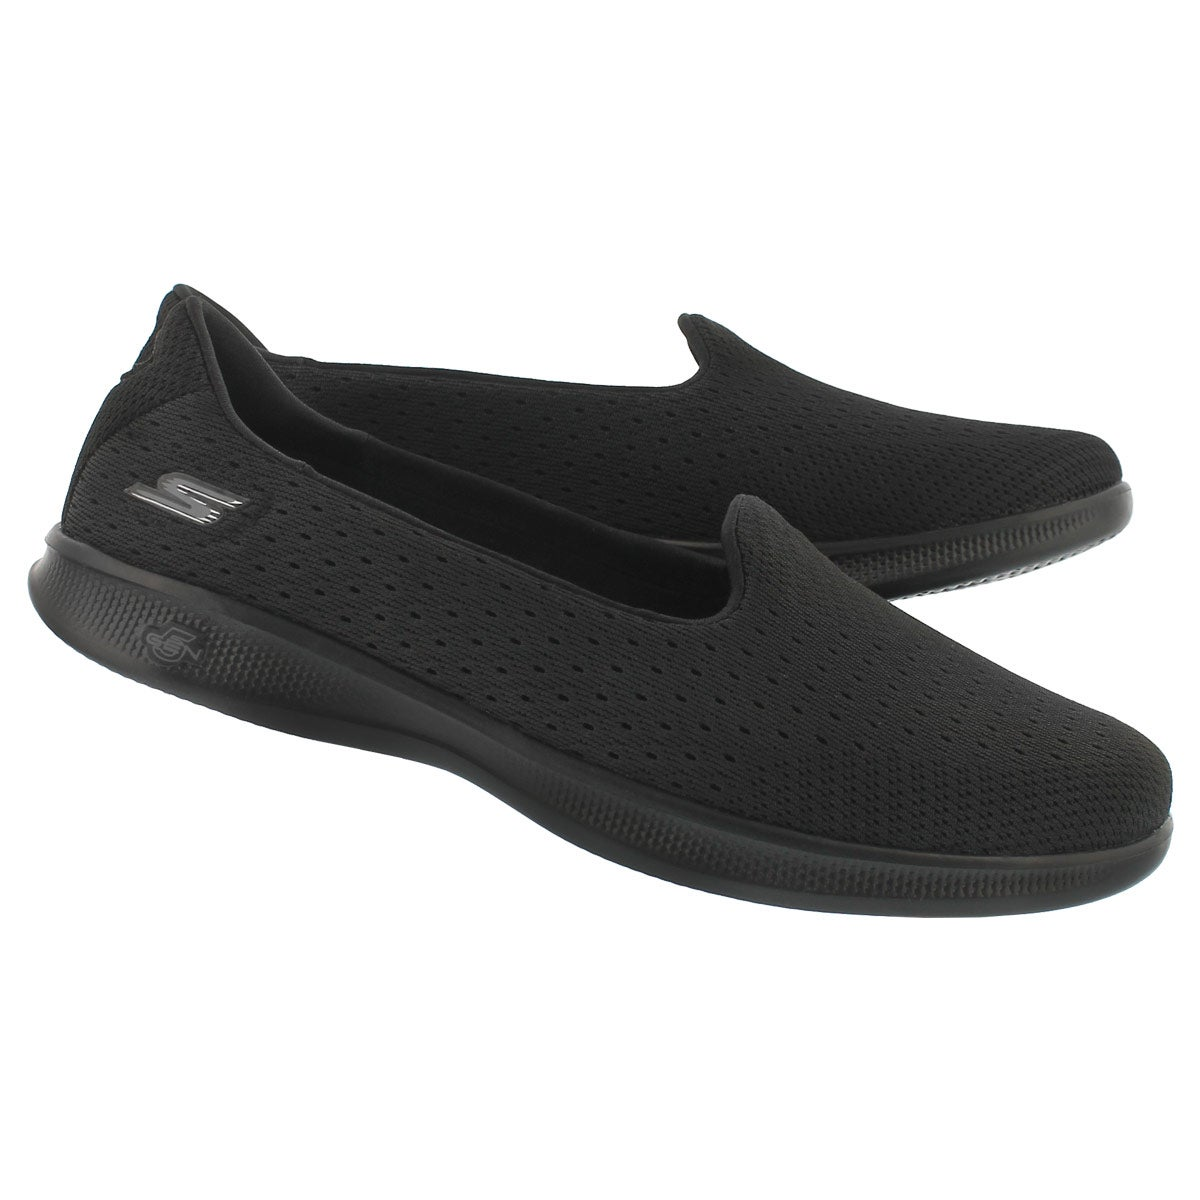 Lds GO Step Lite Origin blk walking shoe